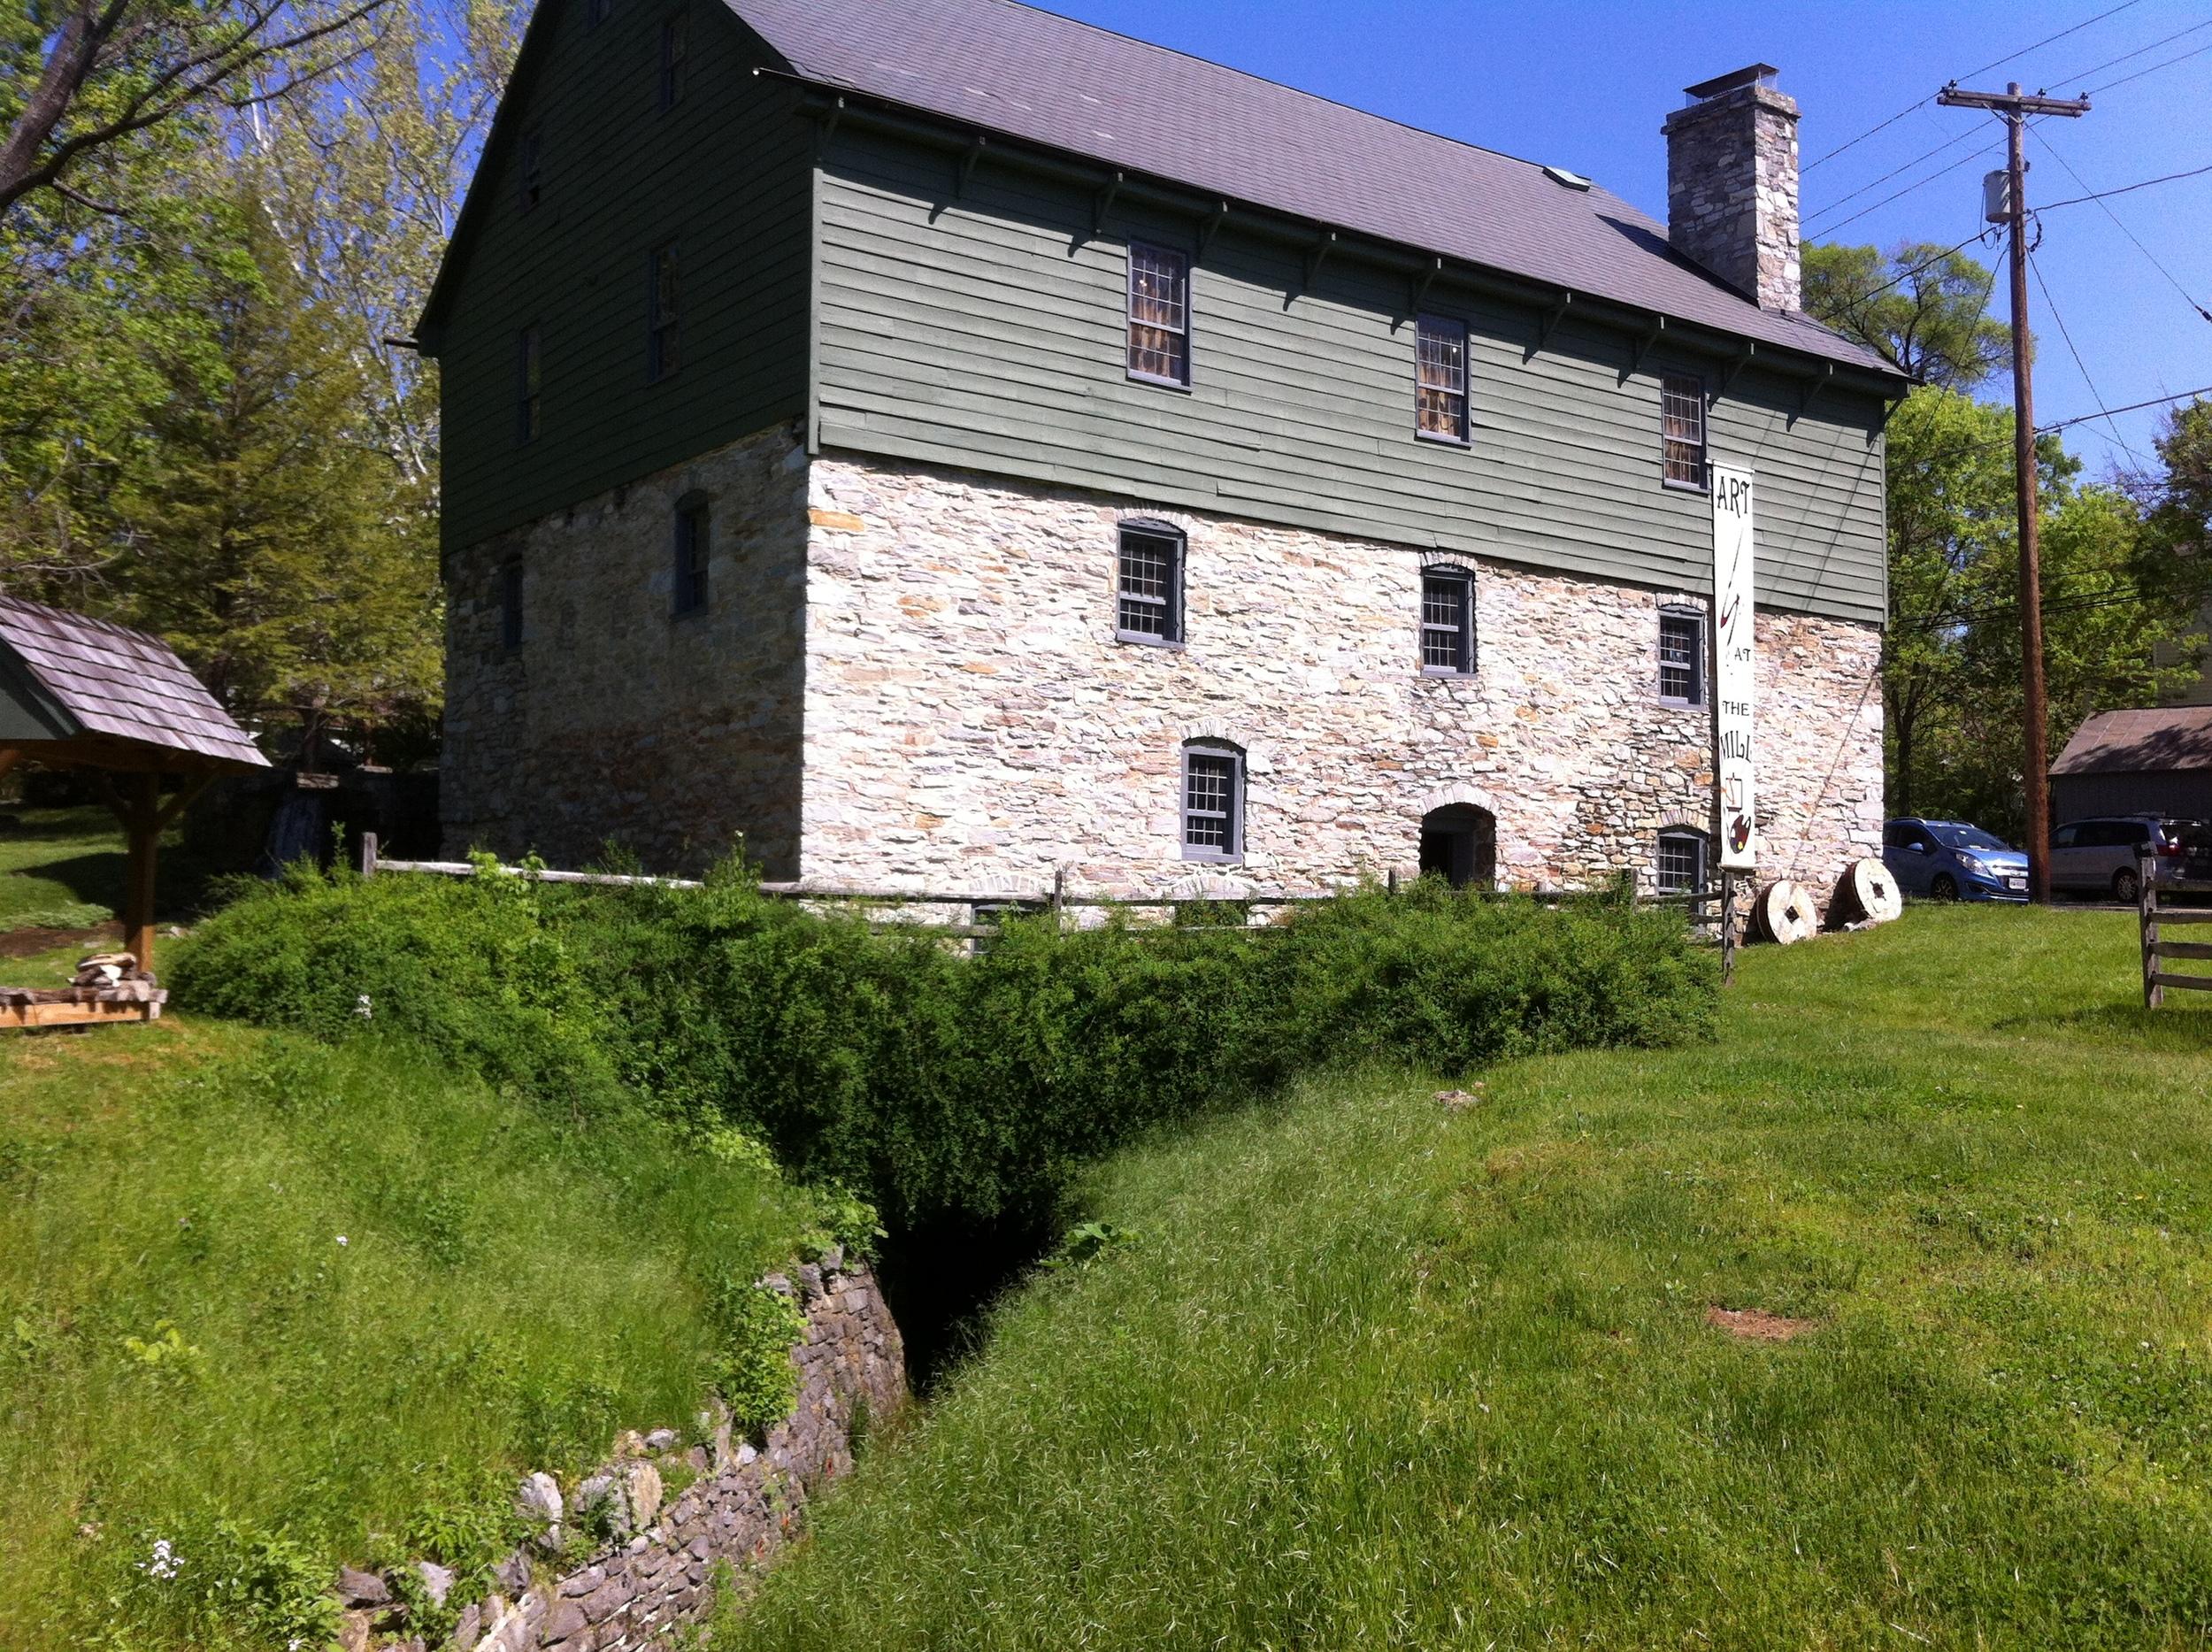 The historic Burwell-Morgan mill in Millwood, VA